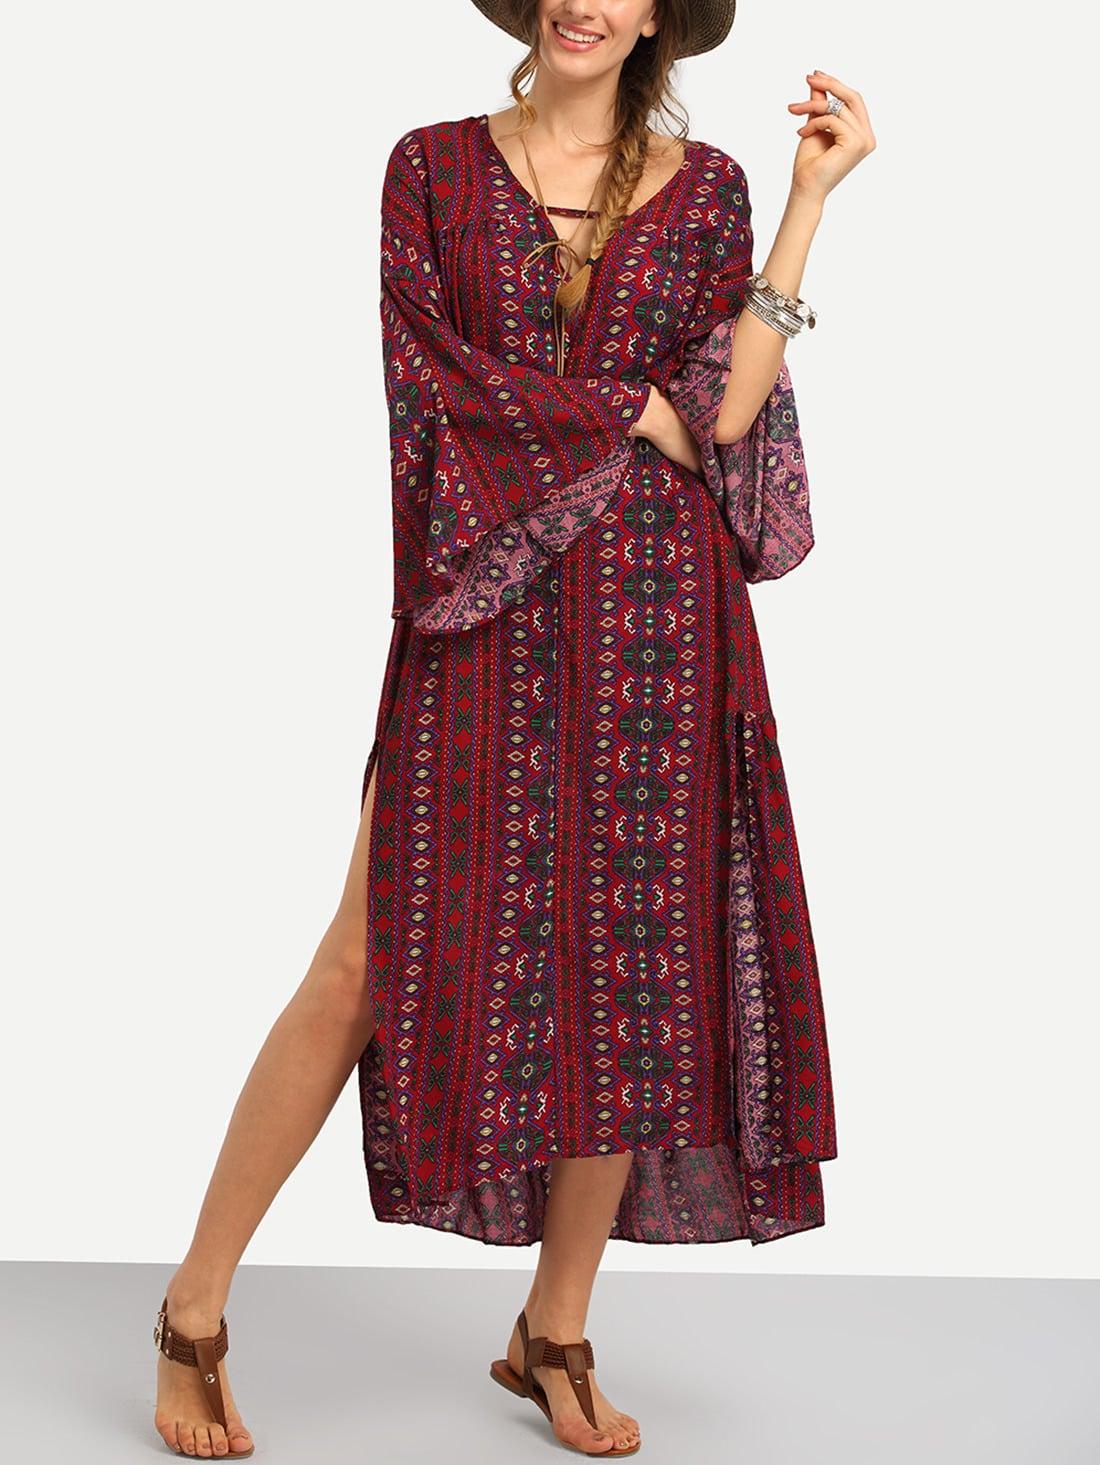 Tribal Print Slit Side Long Dress tribal print dress